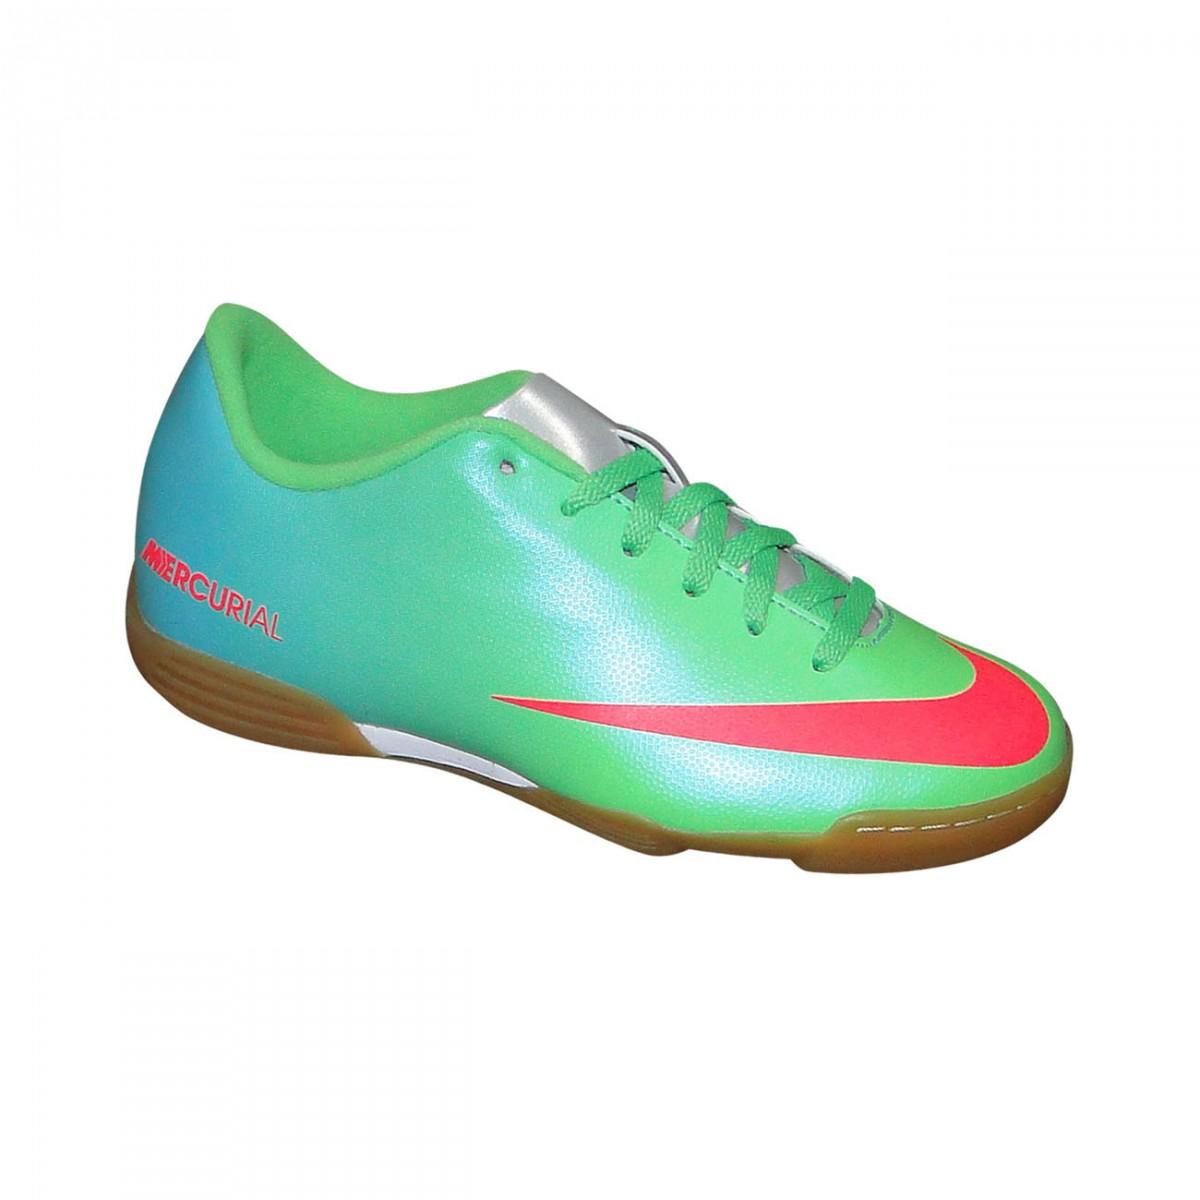 Tenis Nike Mercurial Vortex Infantil 588150 300 - Verde Azul Coral ... 0adc5426519f2